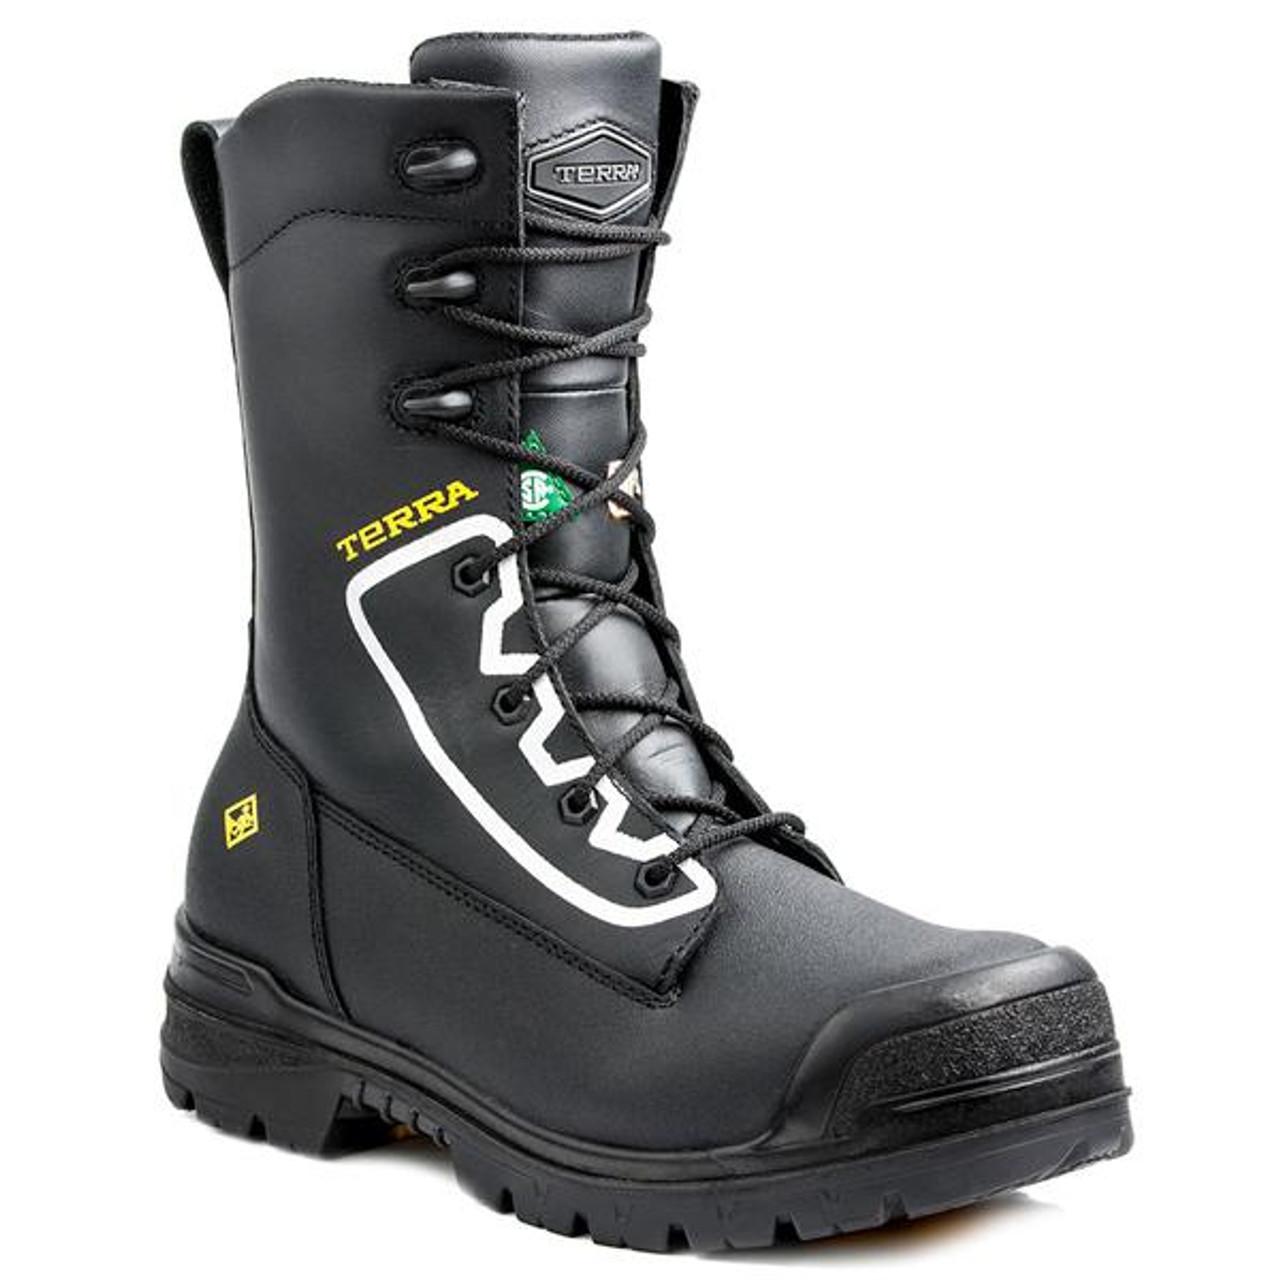 cec724b06127 Men s Terra Leduc 2555B Winter CSA Safety Boot - Herbert s Boots and  Western Wear